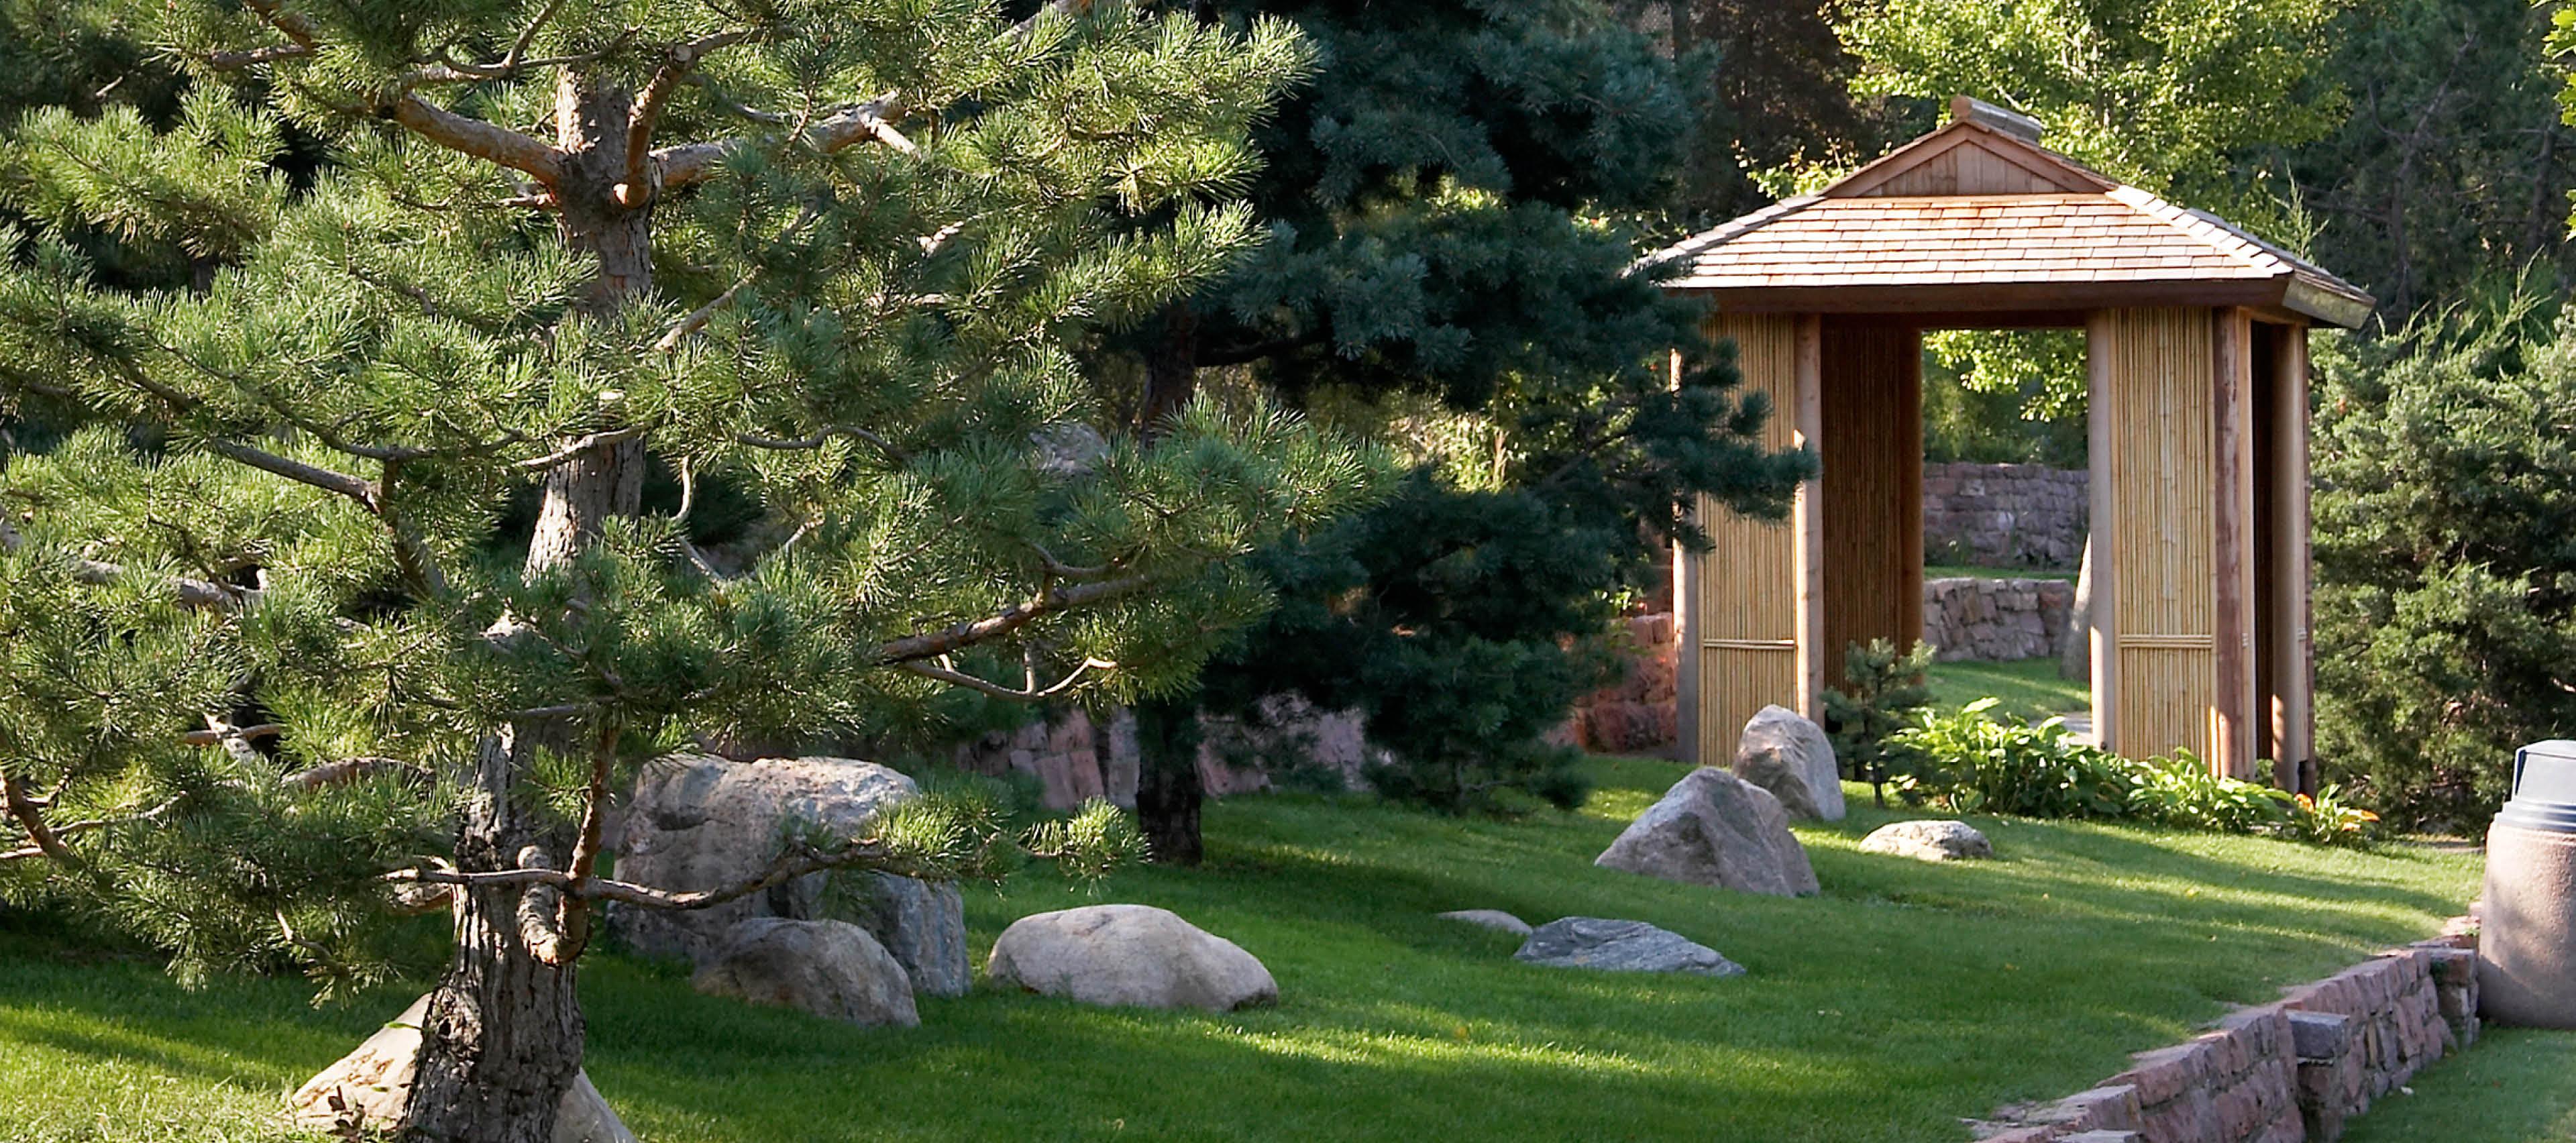 Gardens side view